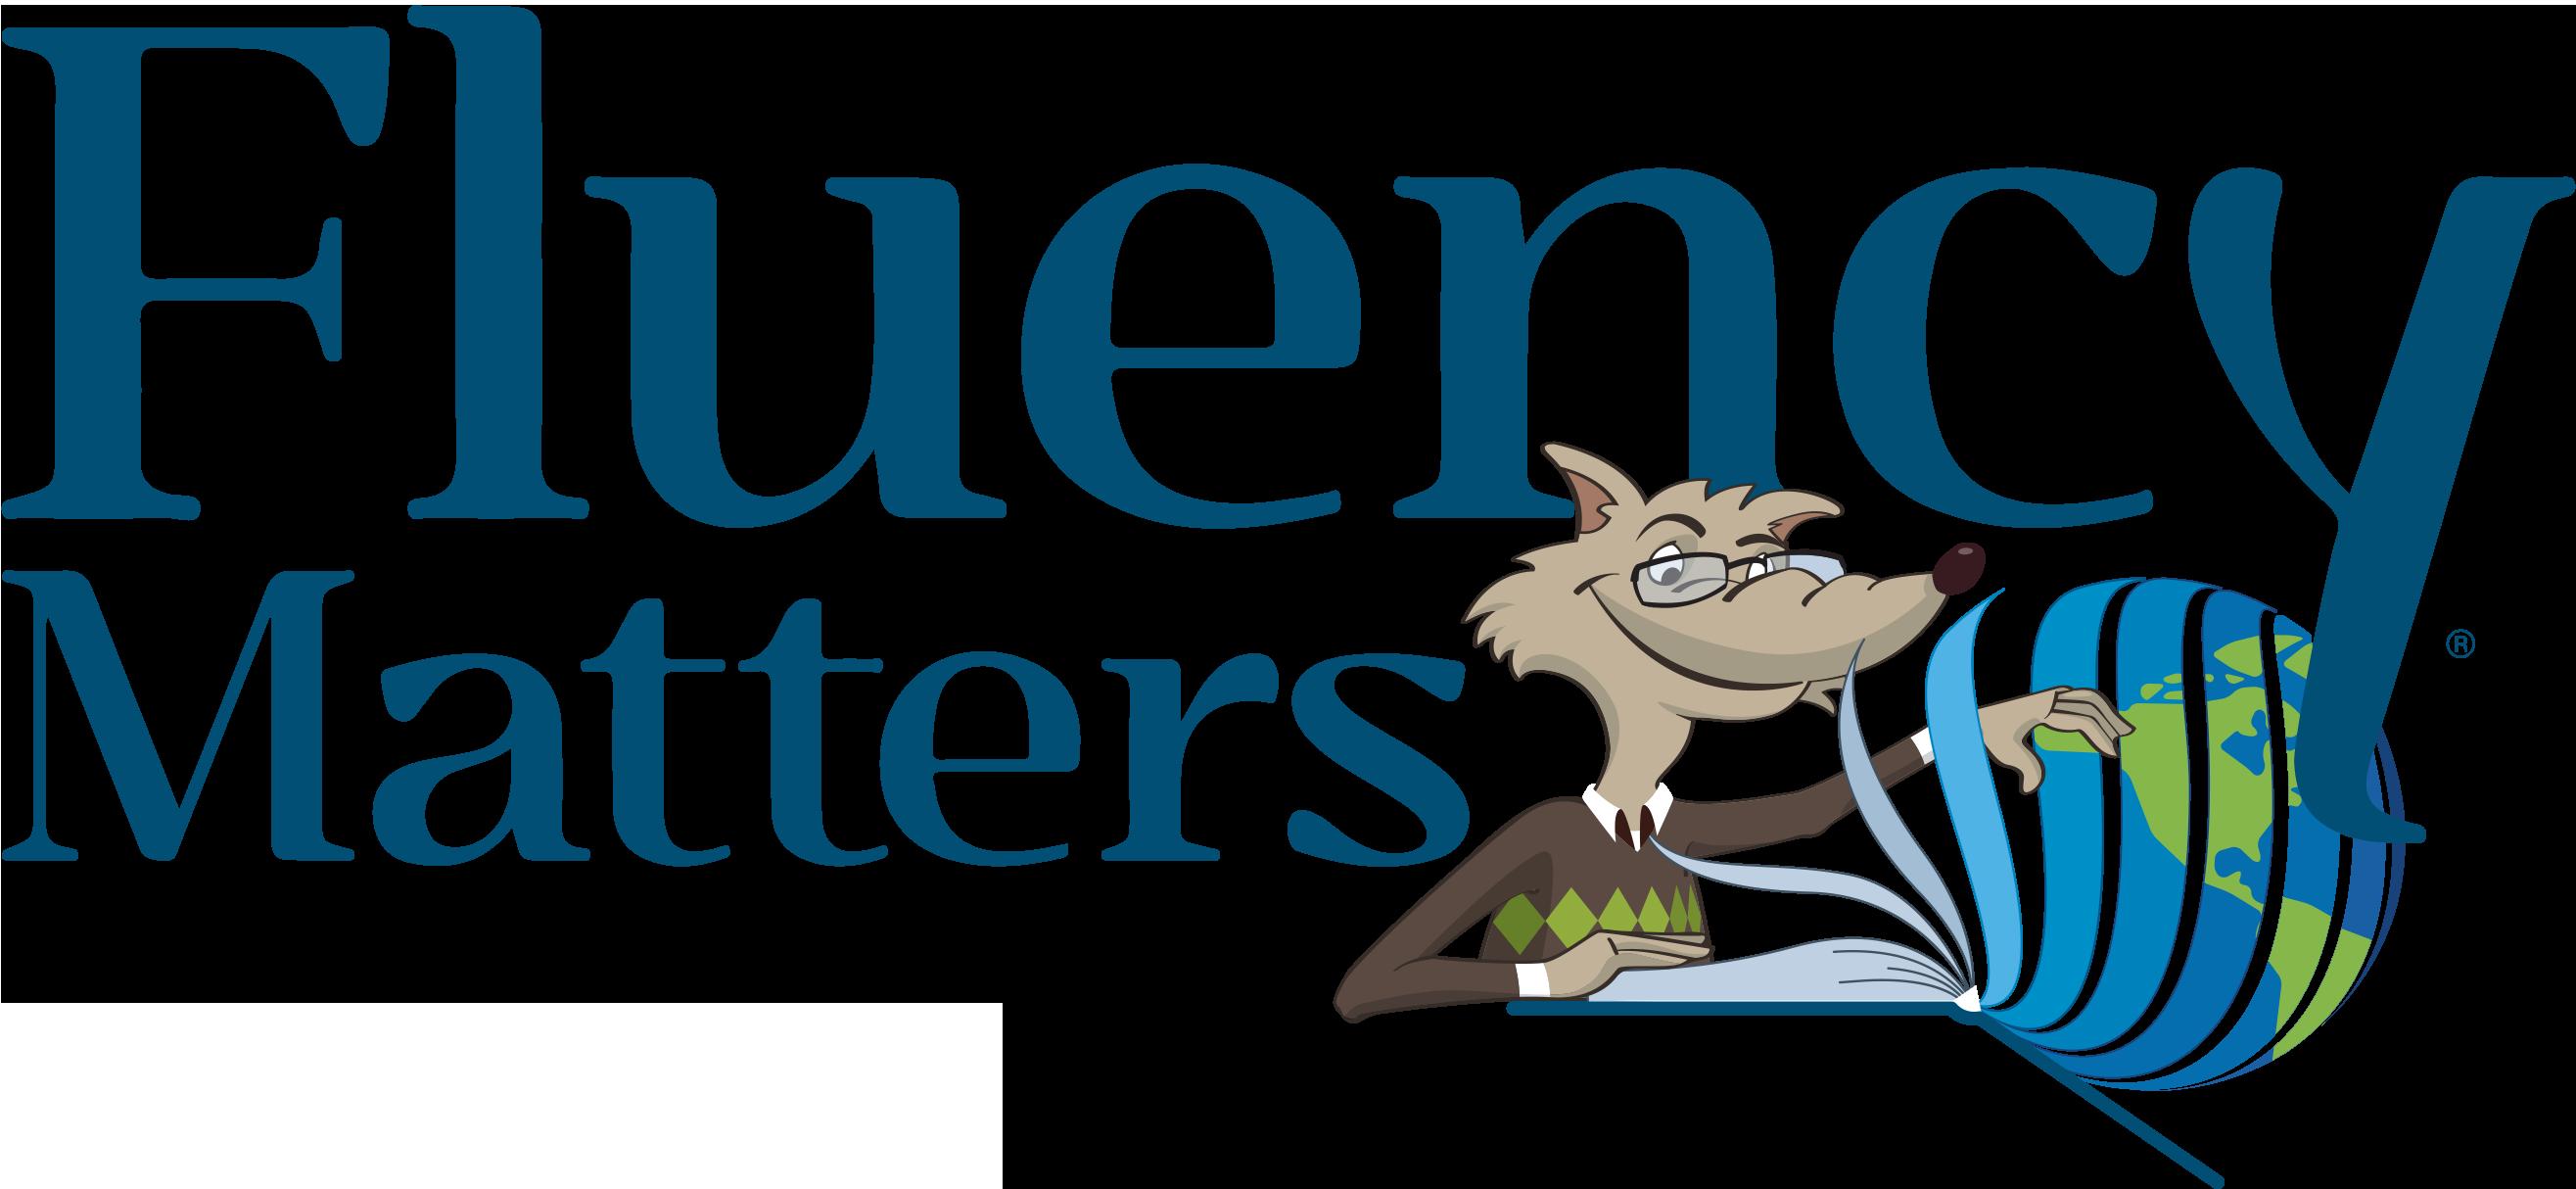 Worksheet 6 Grade fluency matters ci central elem 4 6 grade logo